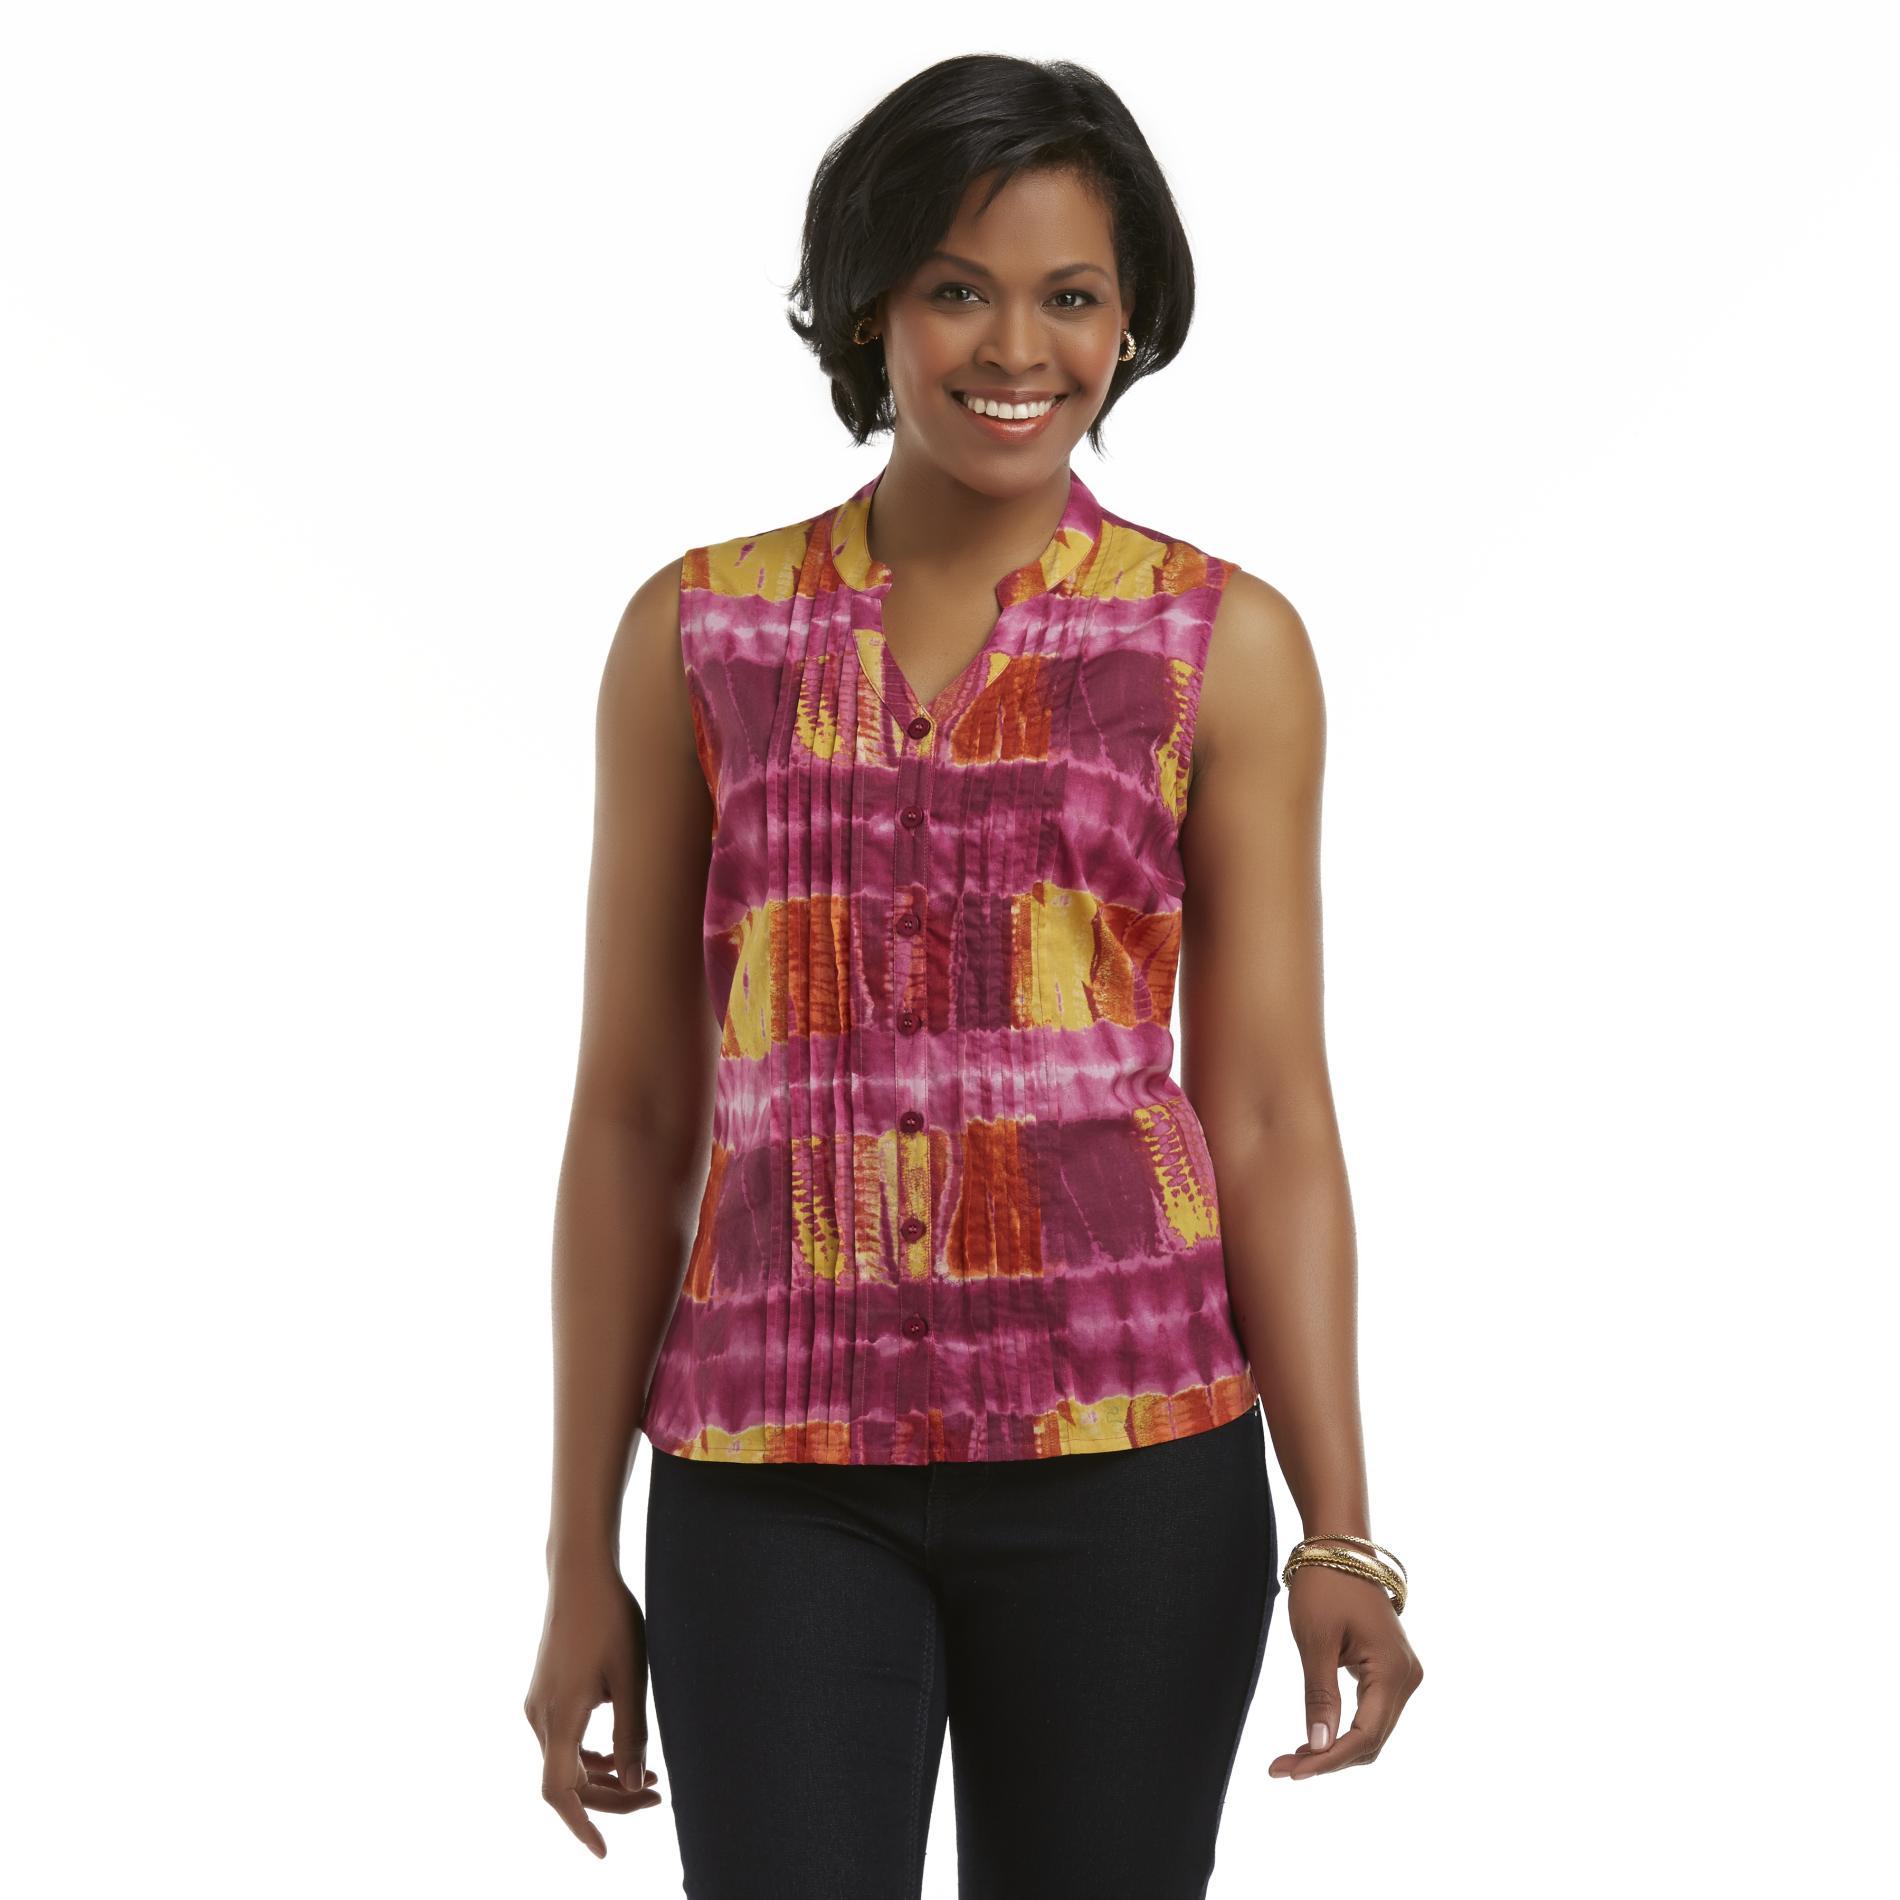 Basic Editions Women's Sleeveless Pintucked Shirt - Tie-Dye at Kmart.com